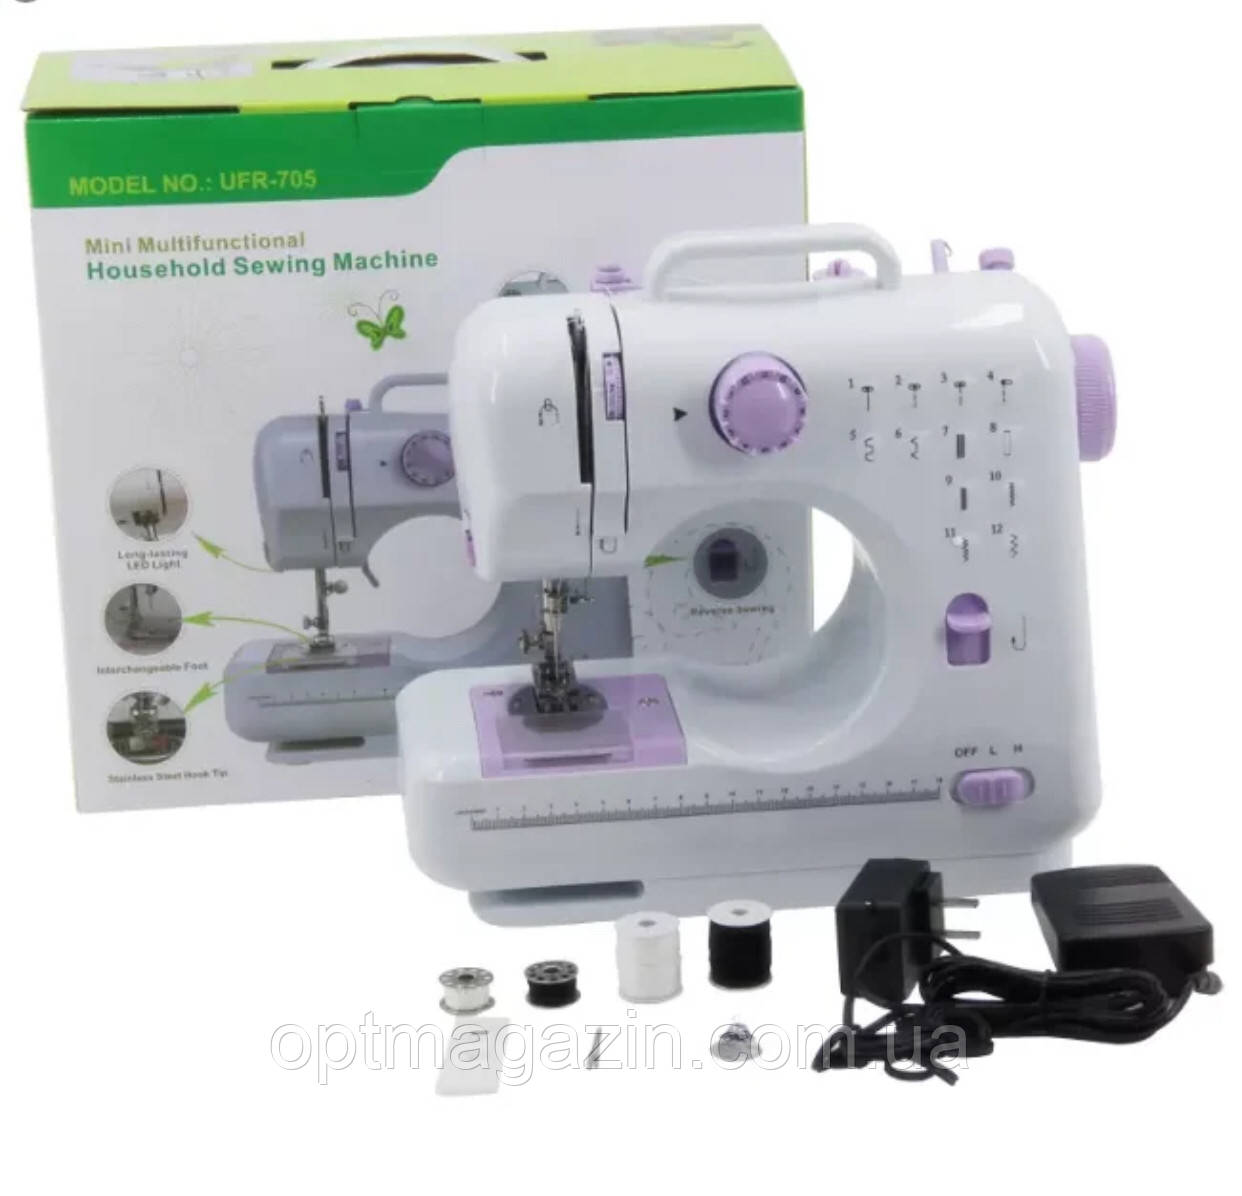 Швейная машинка Mini Multifunctional Household Sewing Machine UFR-705 12 в 1